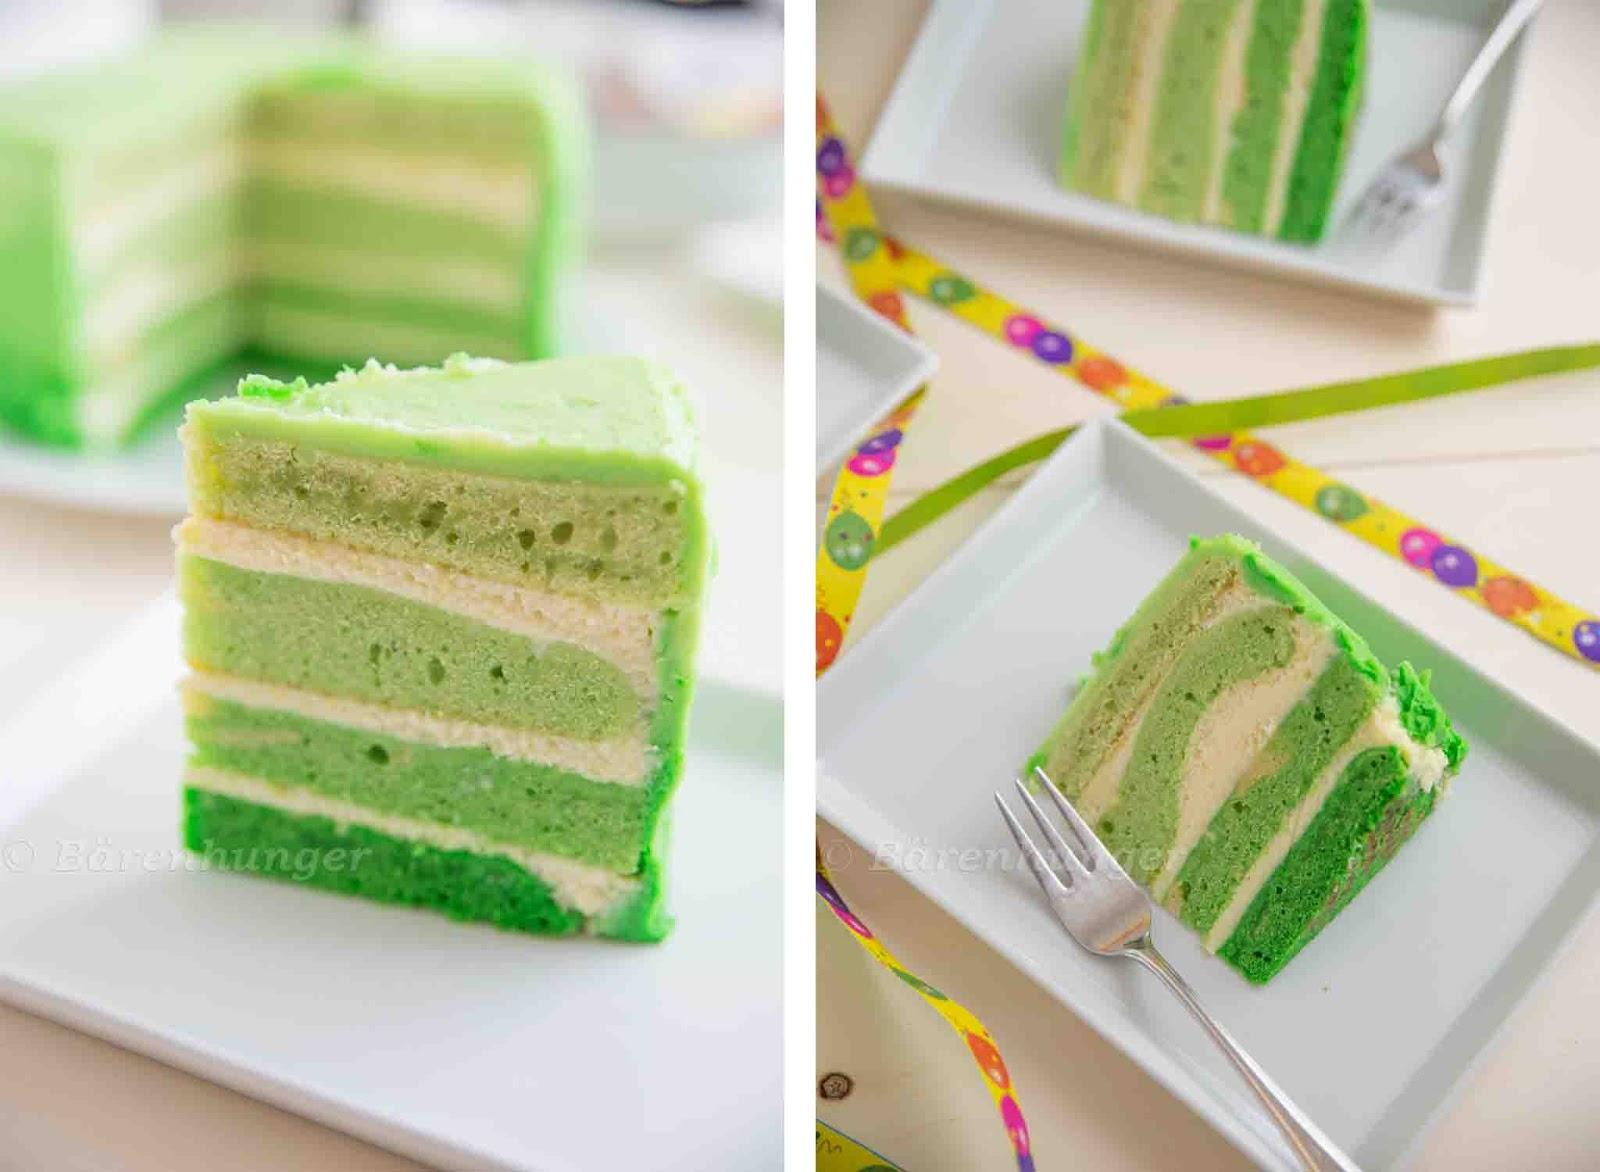 Kuchen mit gruner lebensmittelfarbe